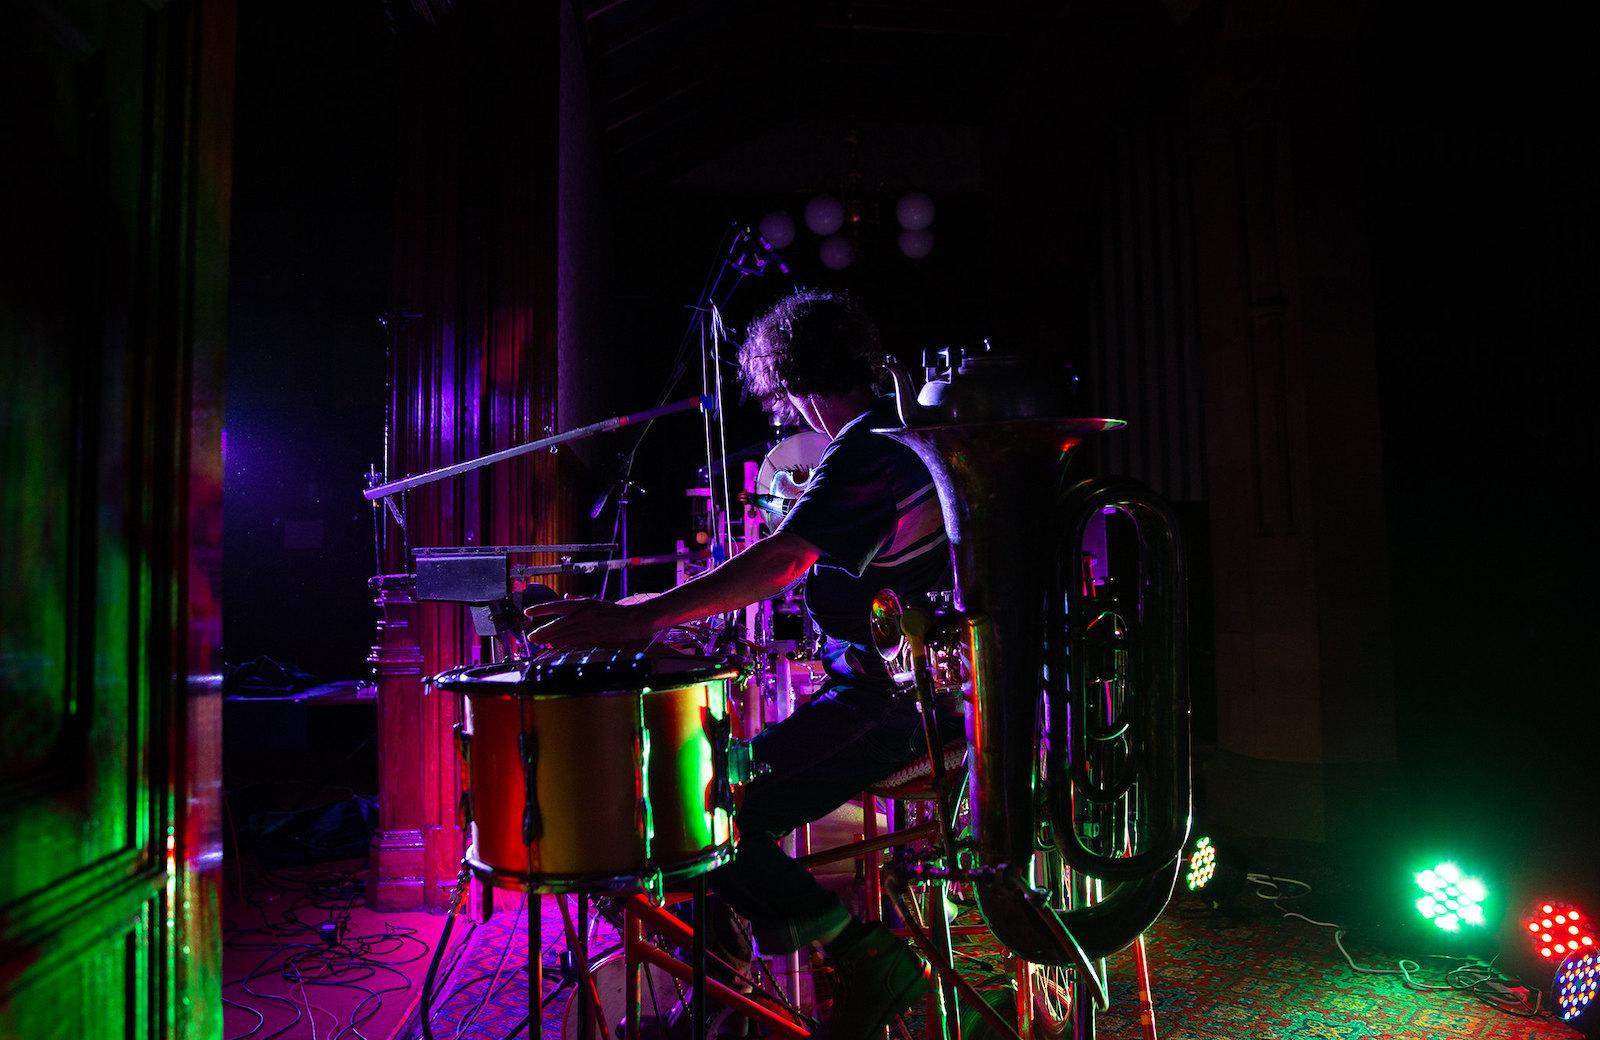 Sarah Kenchinton at Full of Noises 2019